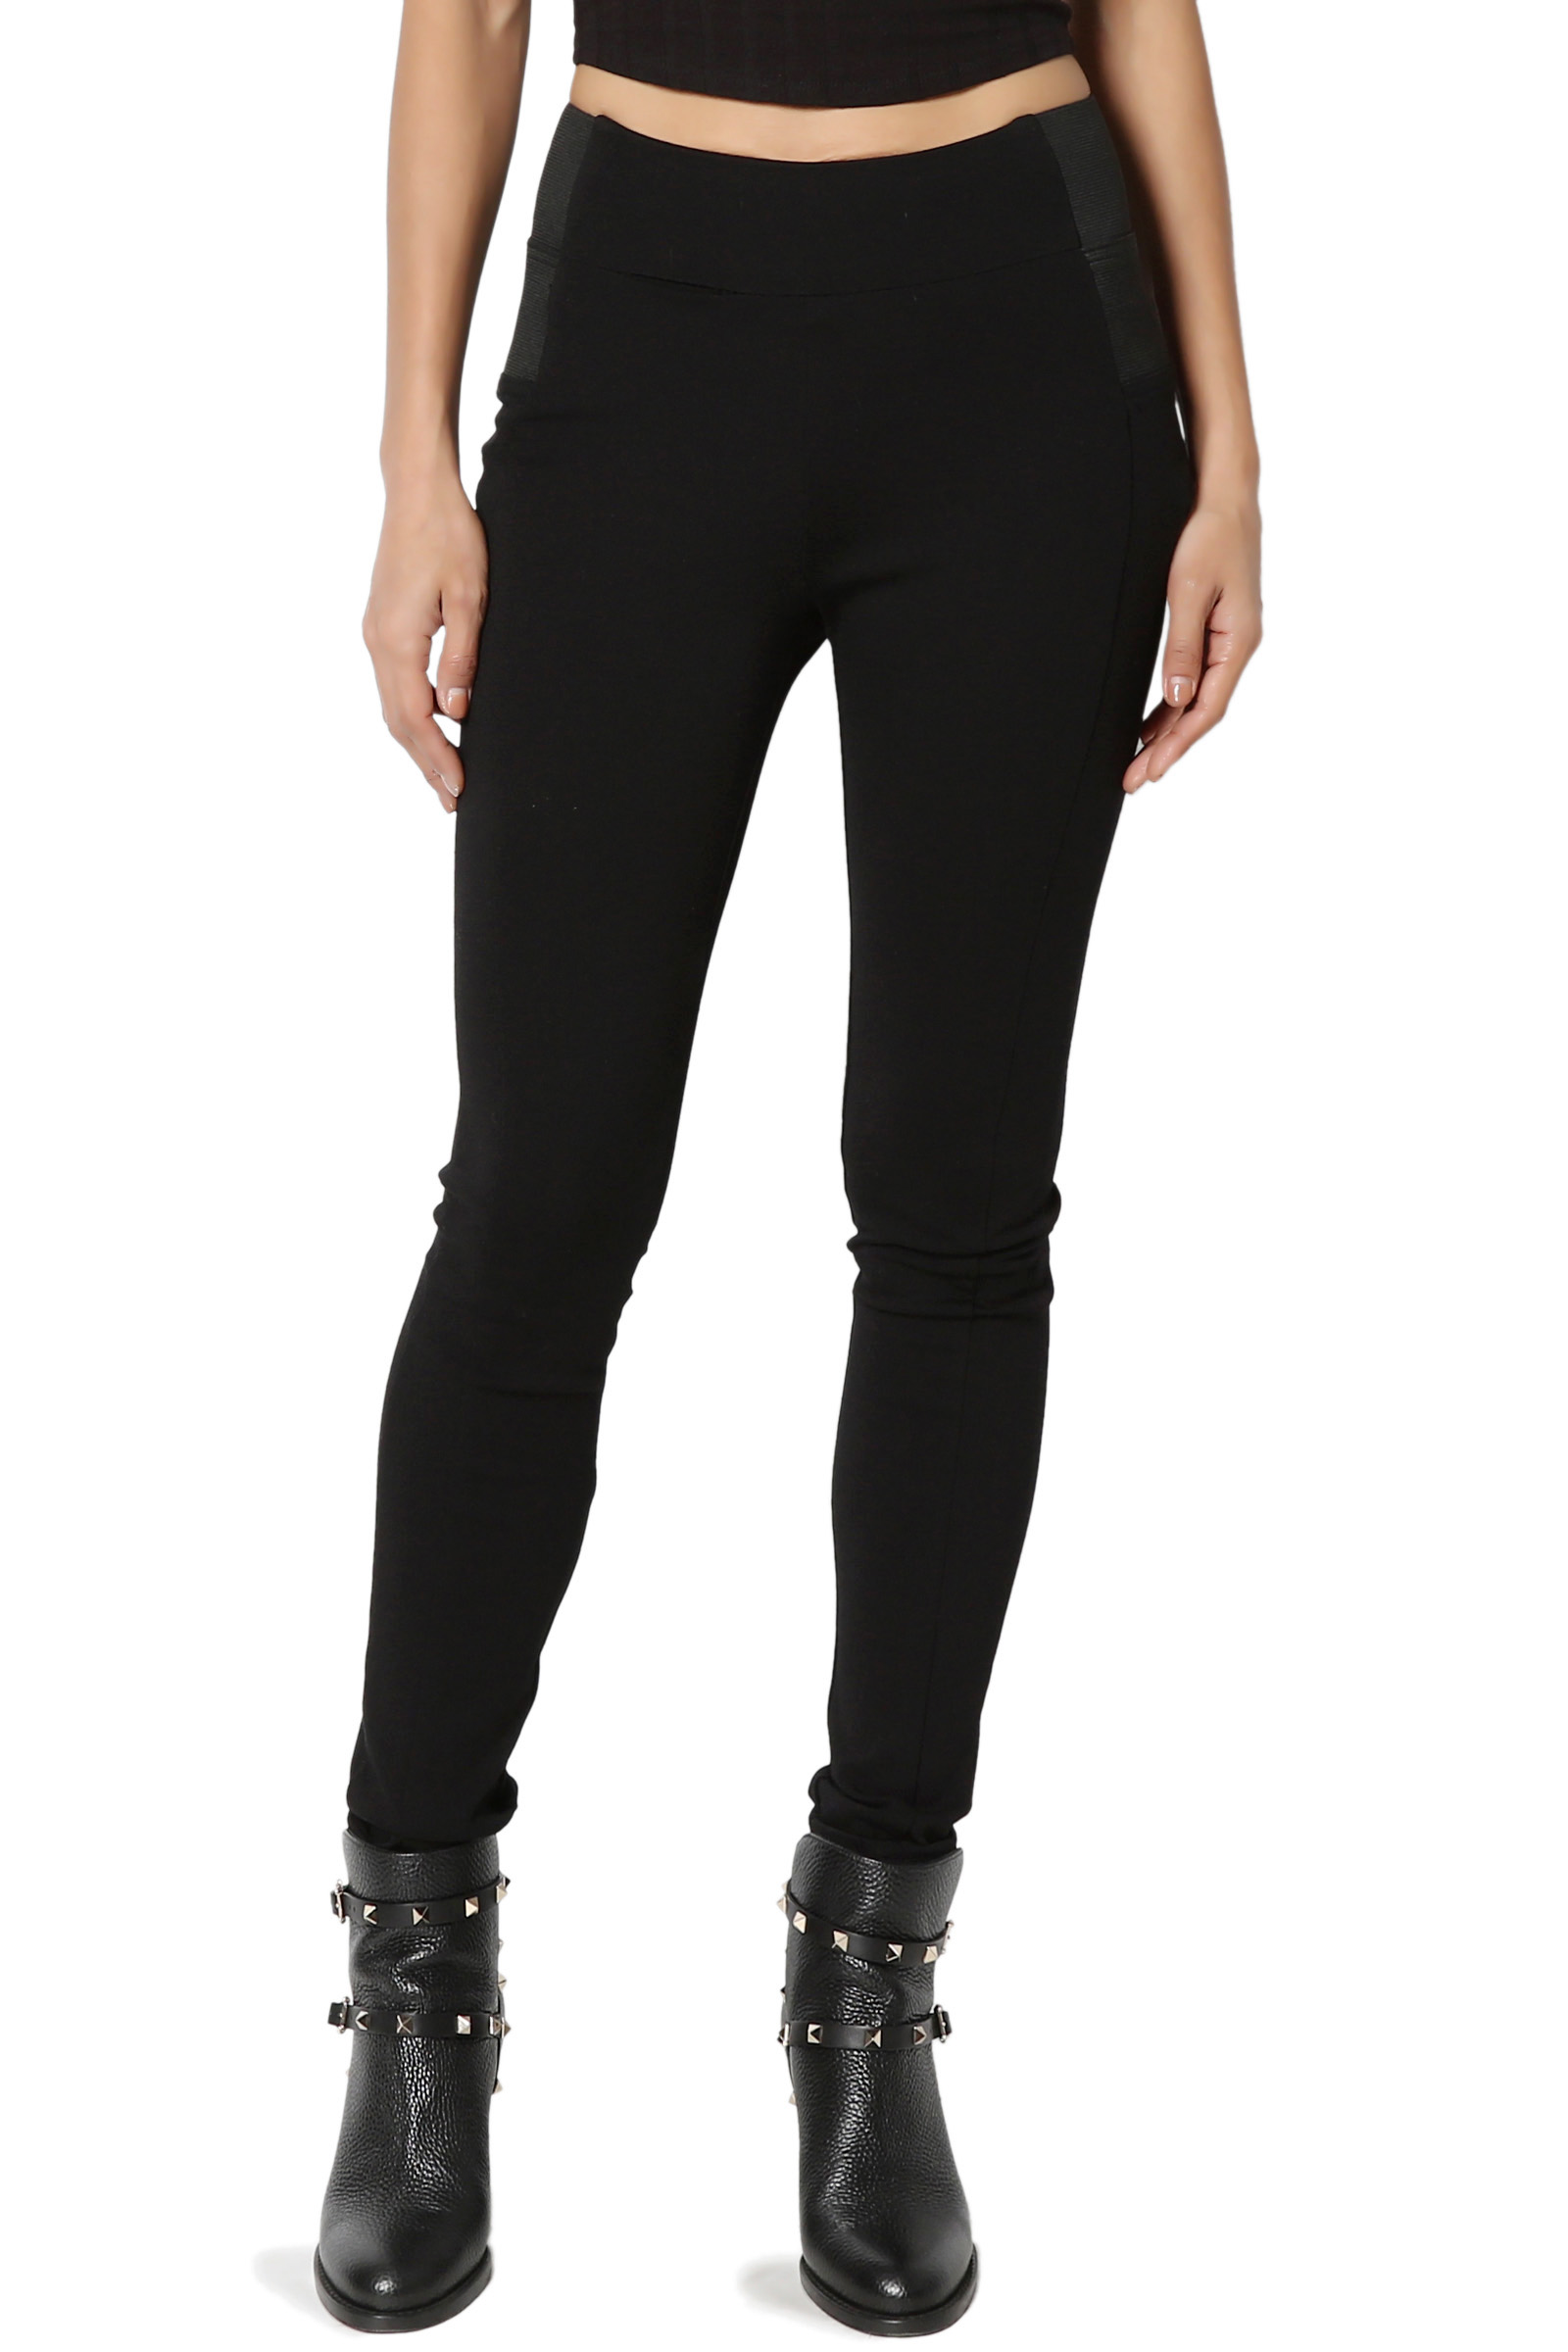 TheMogan PLUS Everyday Basic Ponte Knit Elastic High Waisted Ankle Skinny Pants